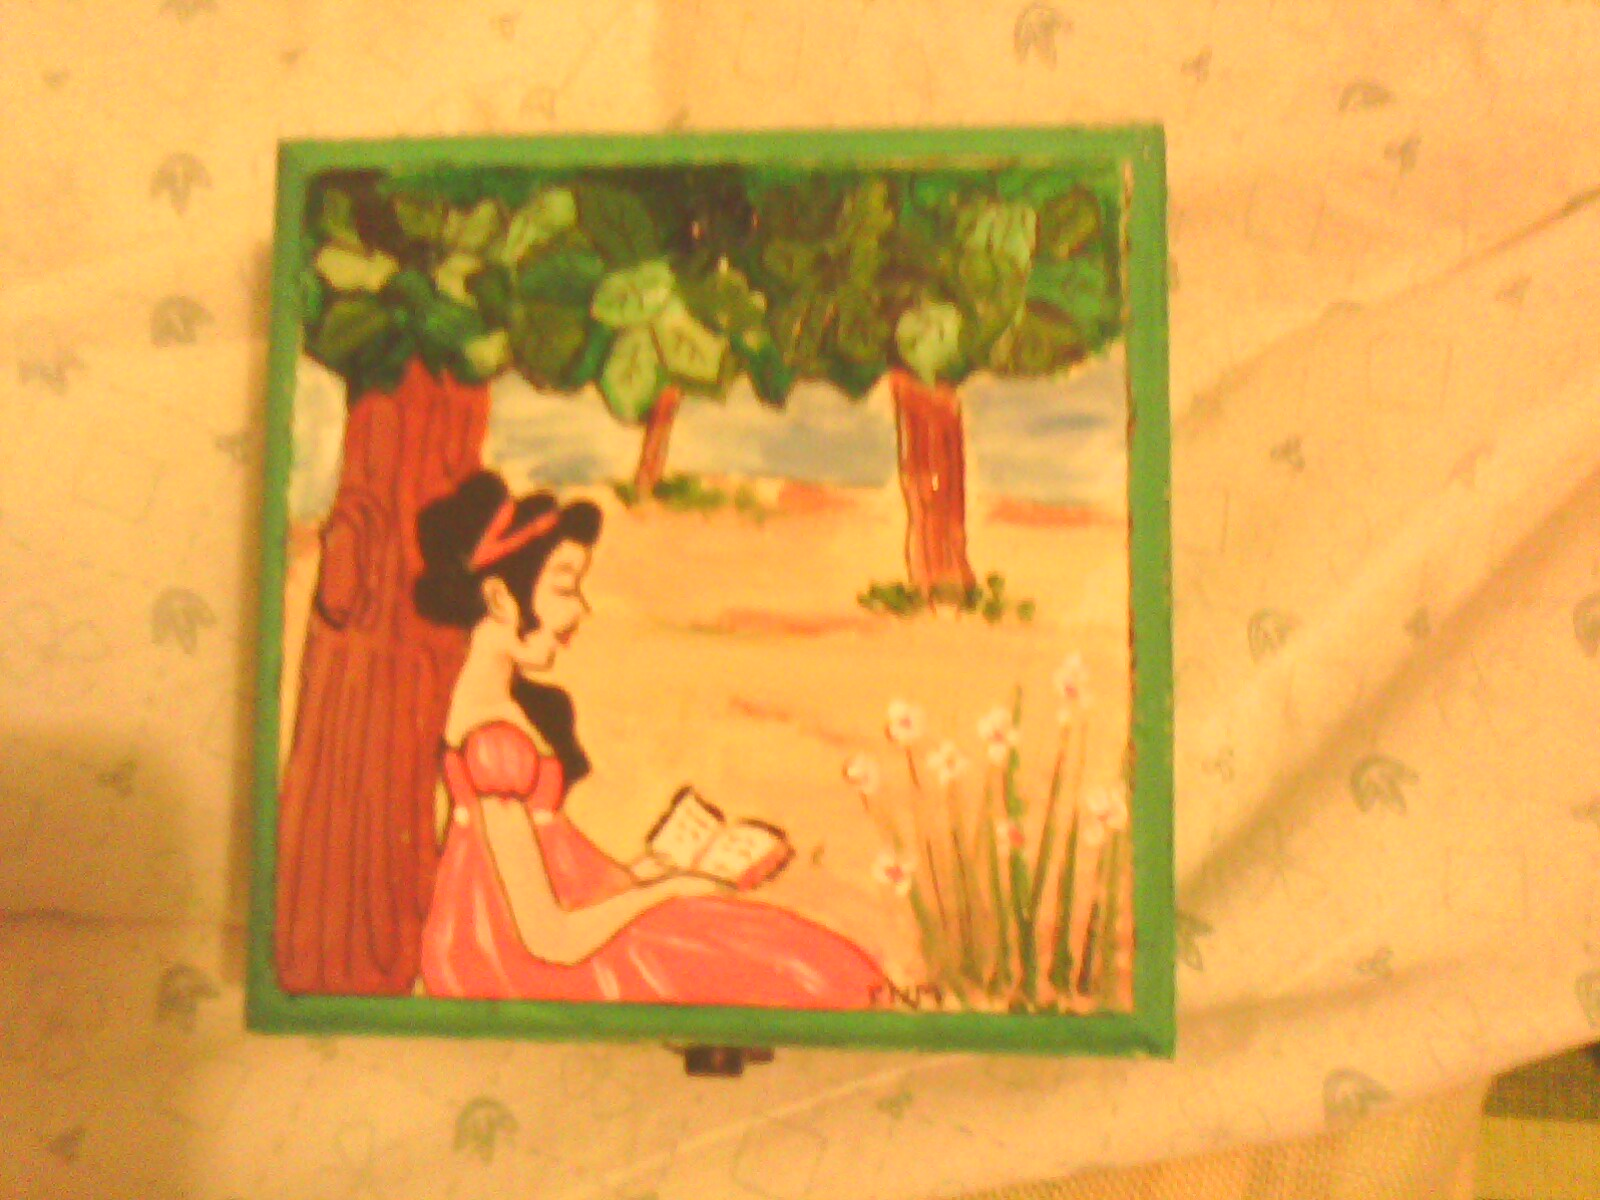 Manualidades gorrino gordo cajas de madera pintadas ii - Manualidades cajas de madera ...